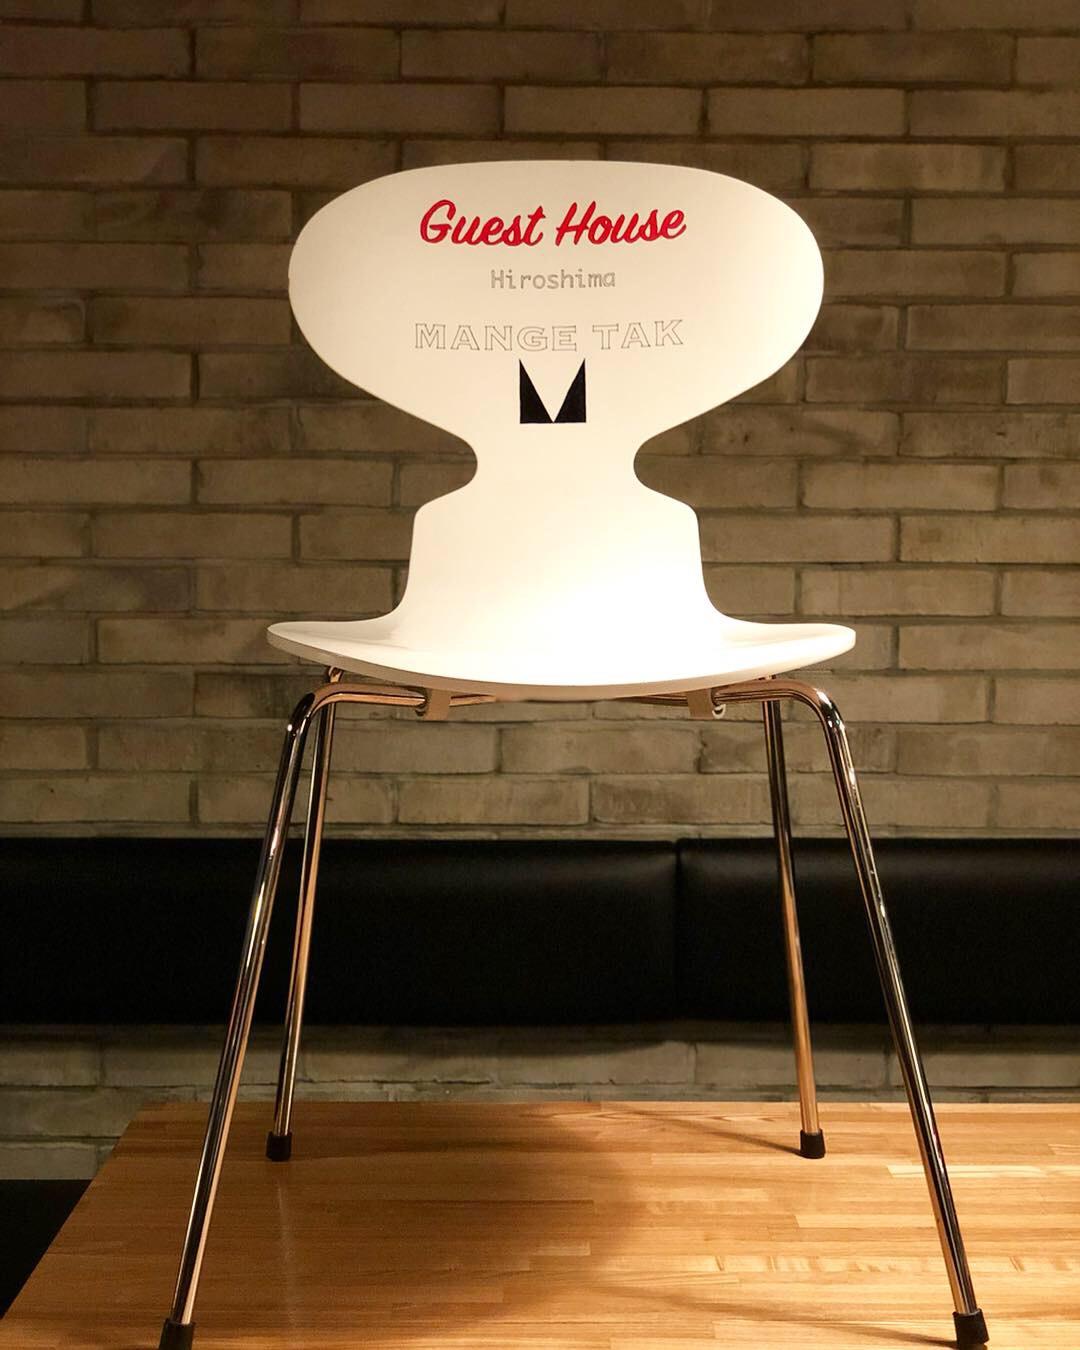 http://www.sora-design.com/images/bl-4477.JPG